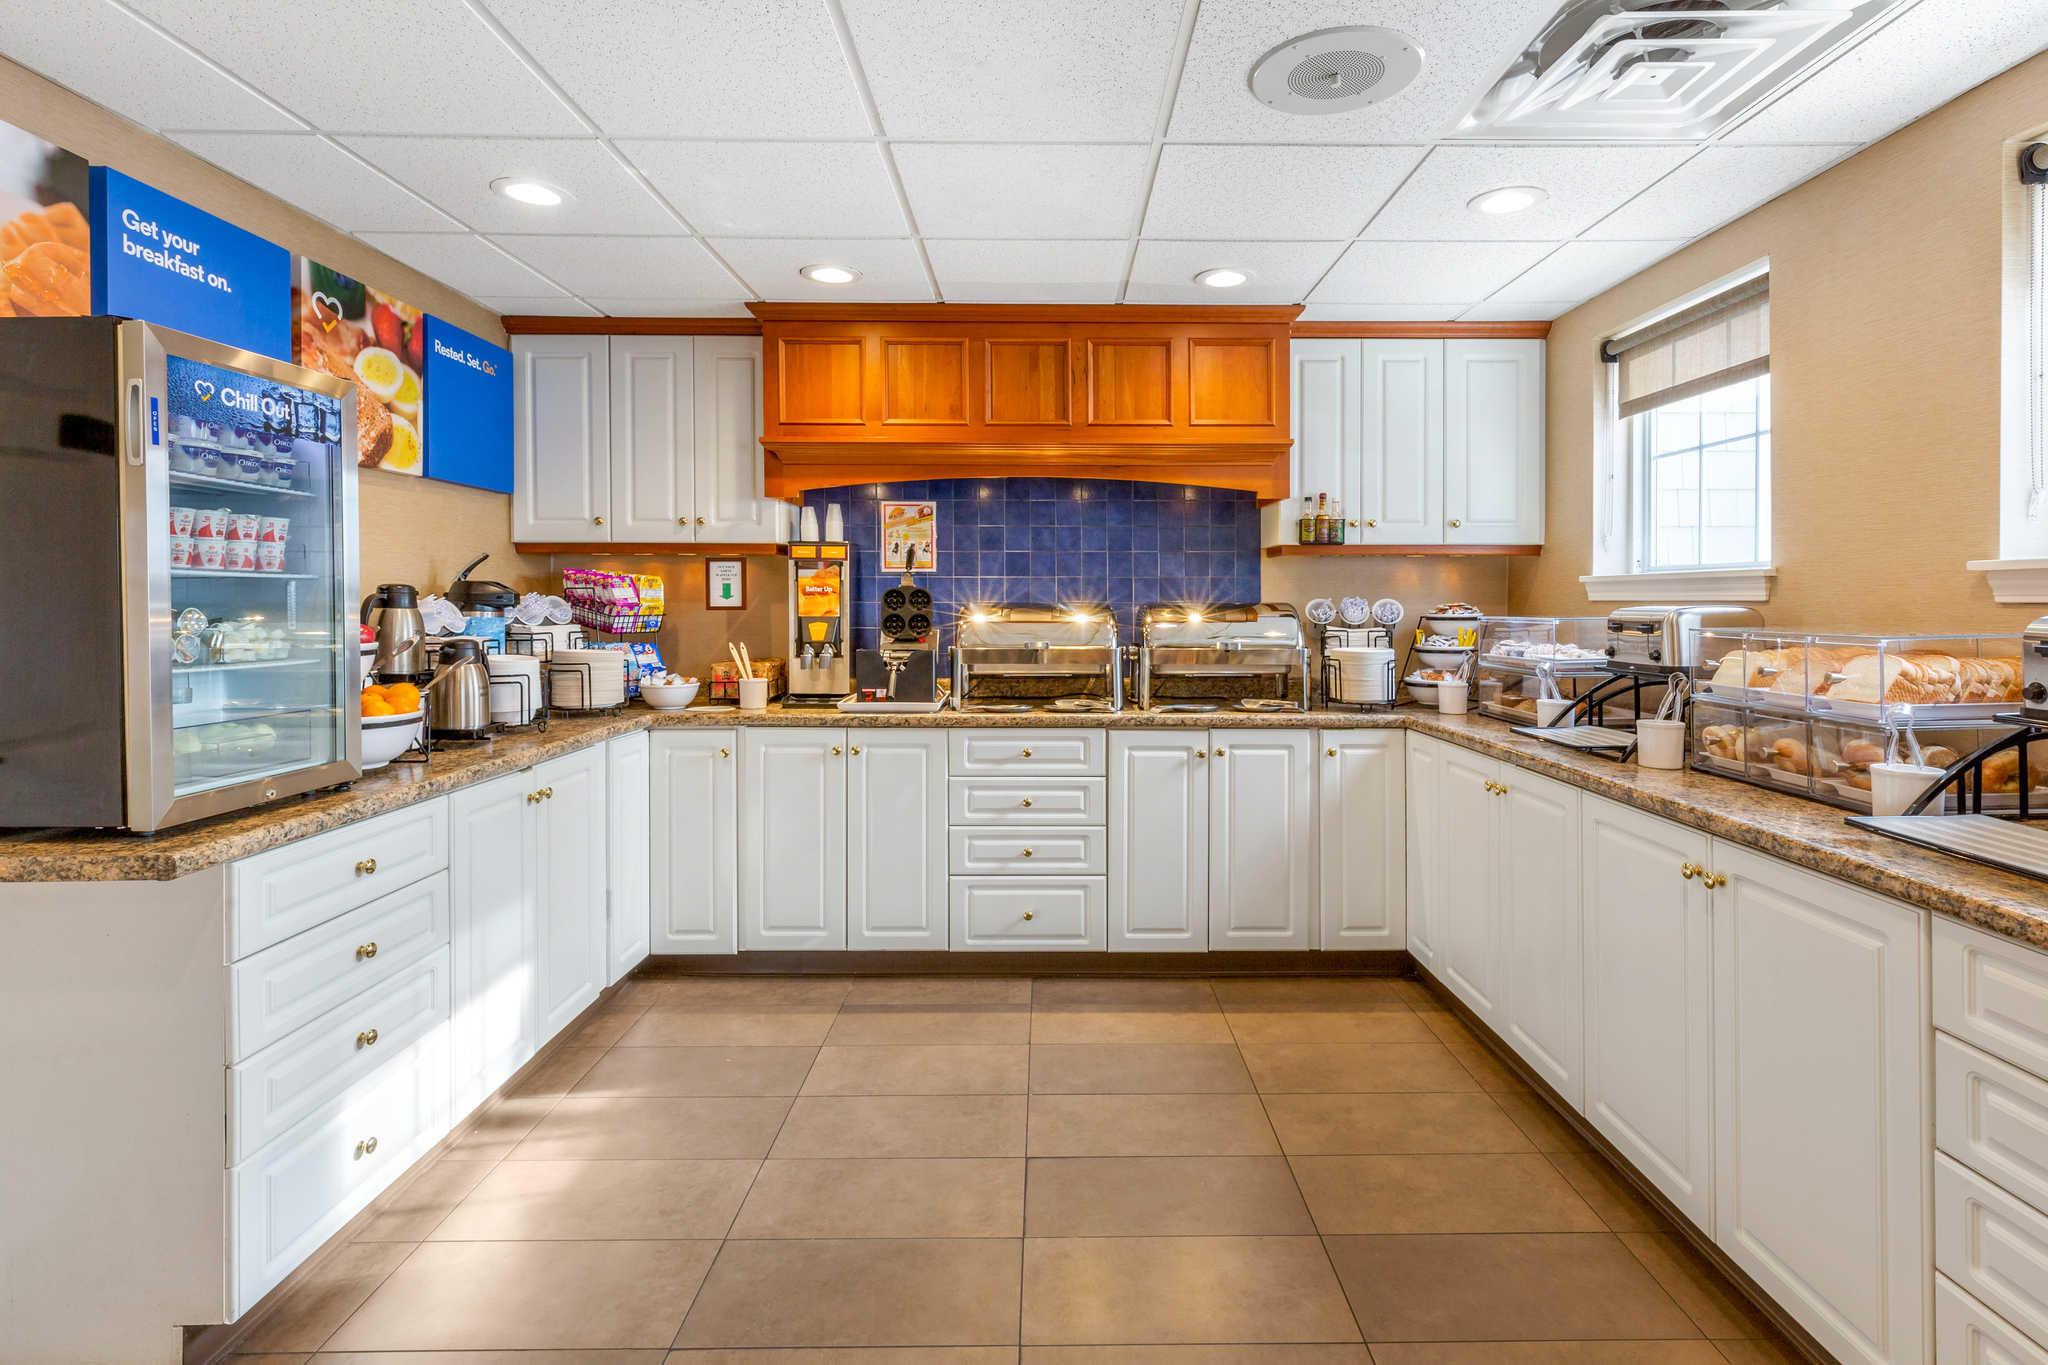 Comfort Inn & Suites image 36